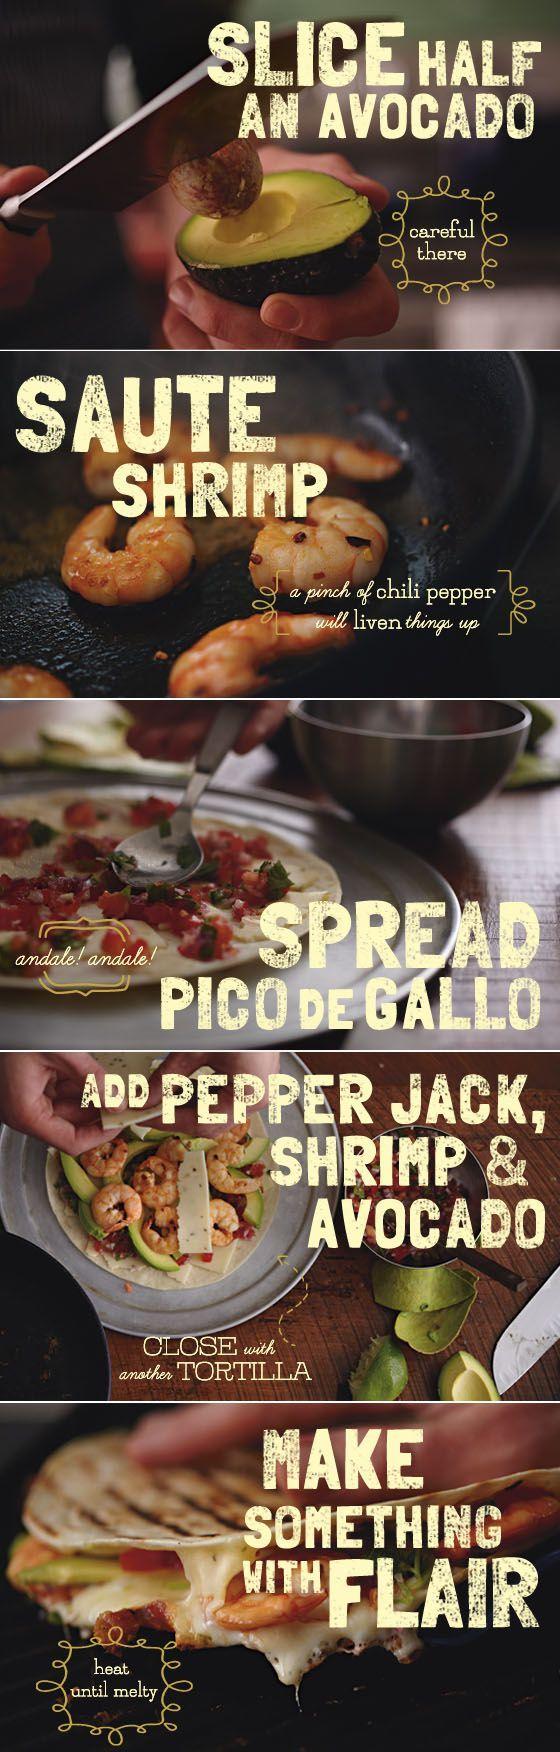 ... Jack Quesadillas, Shrimp Recipe, Quesadillas Recipe, Cheese